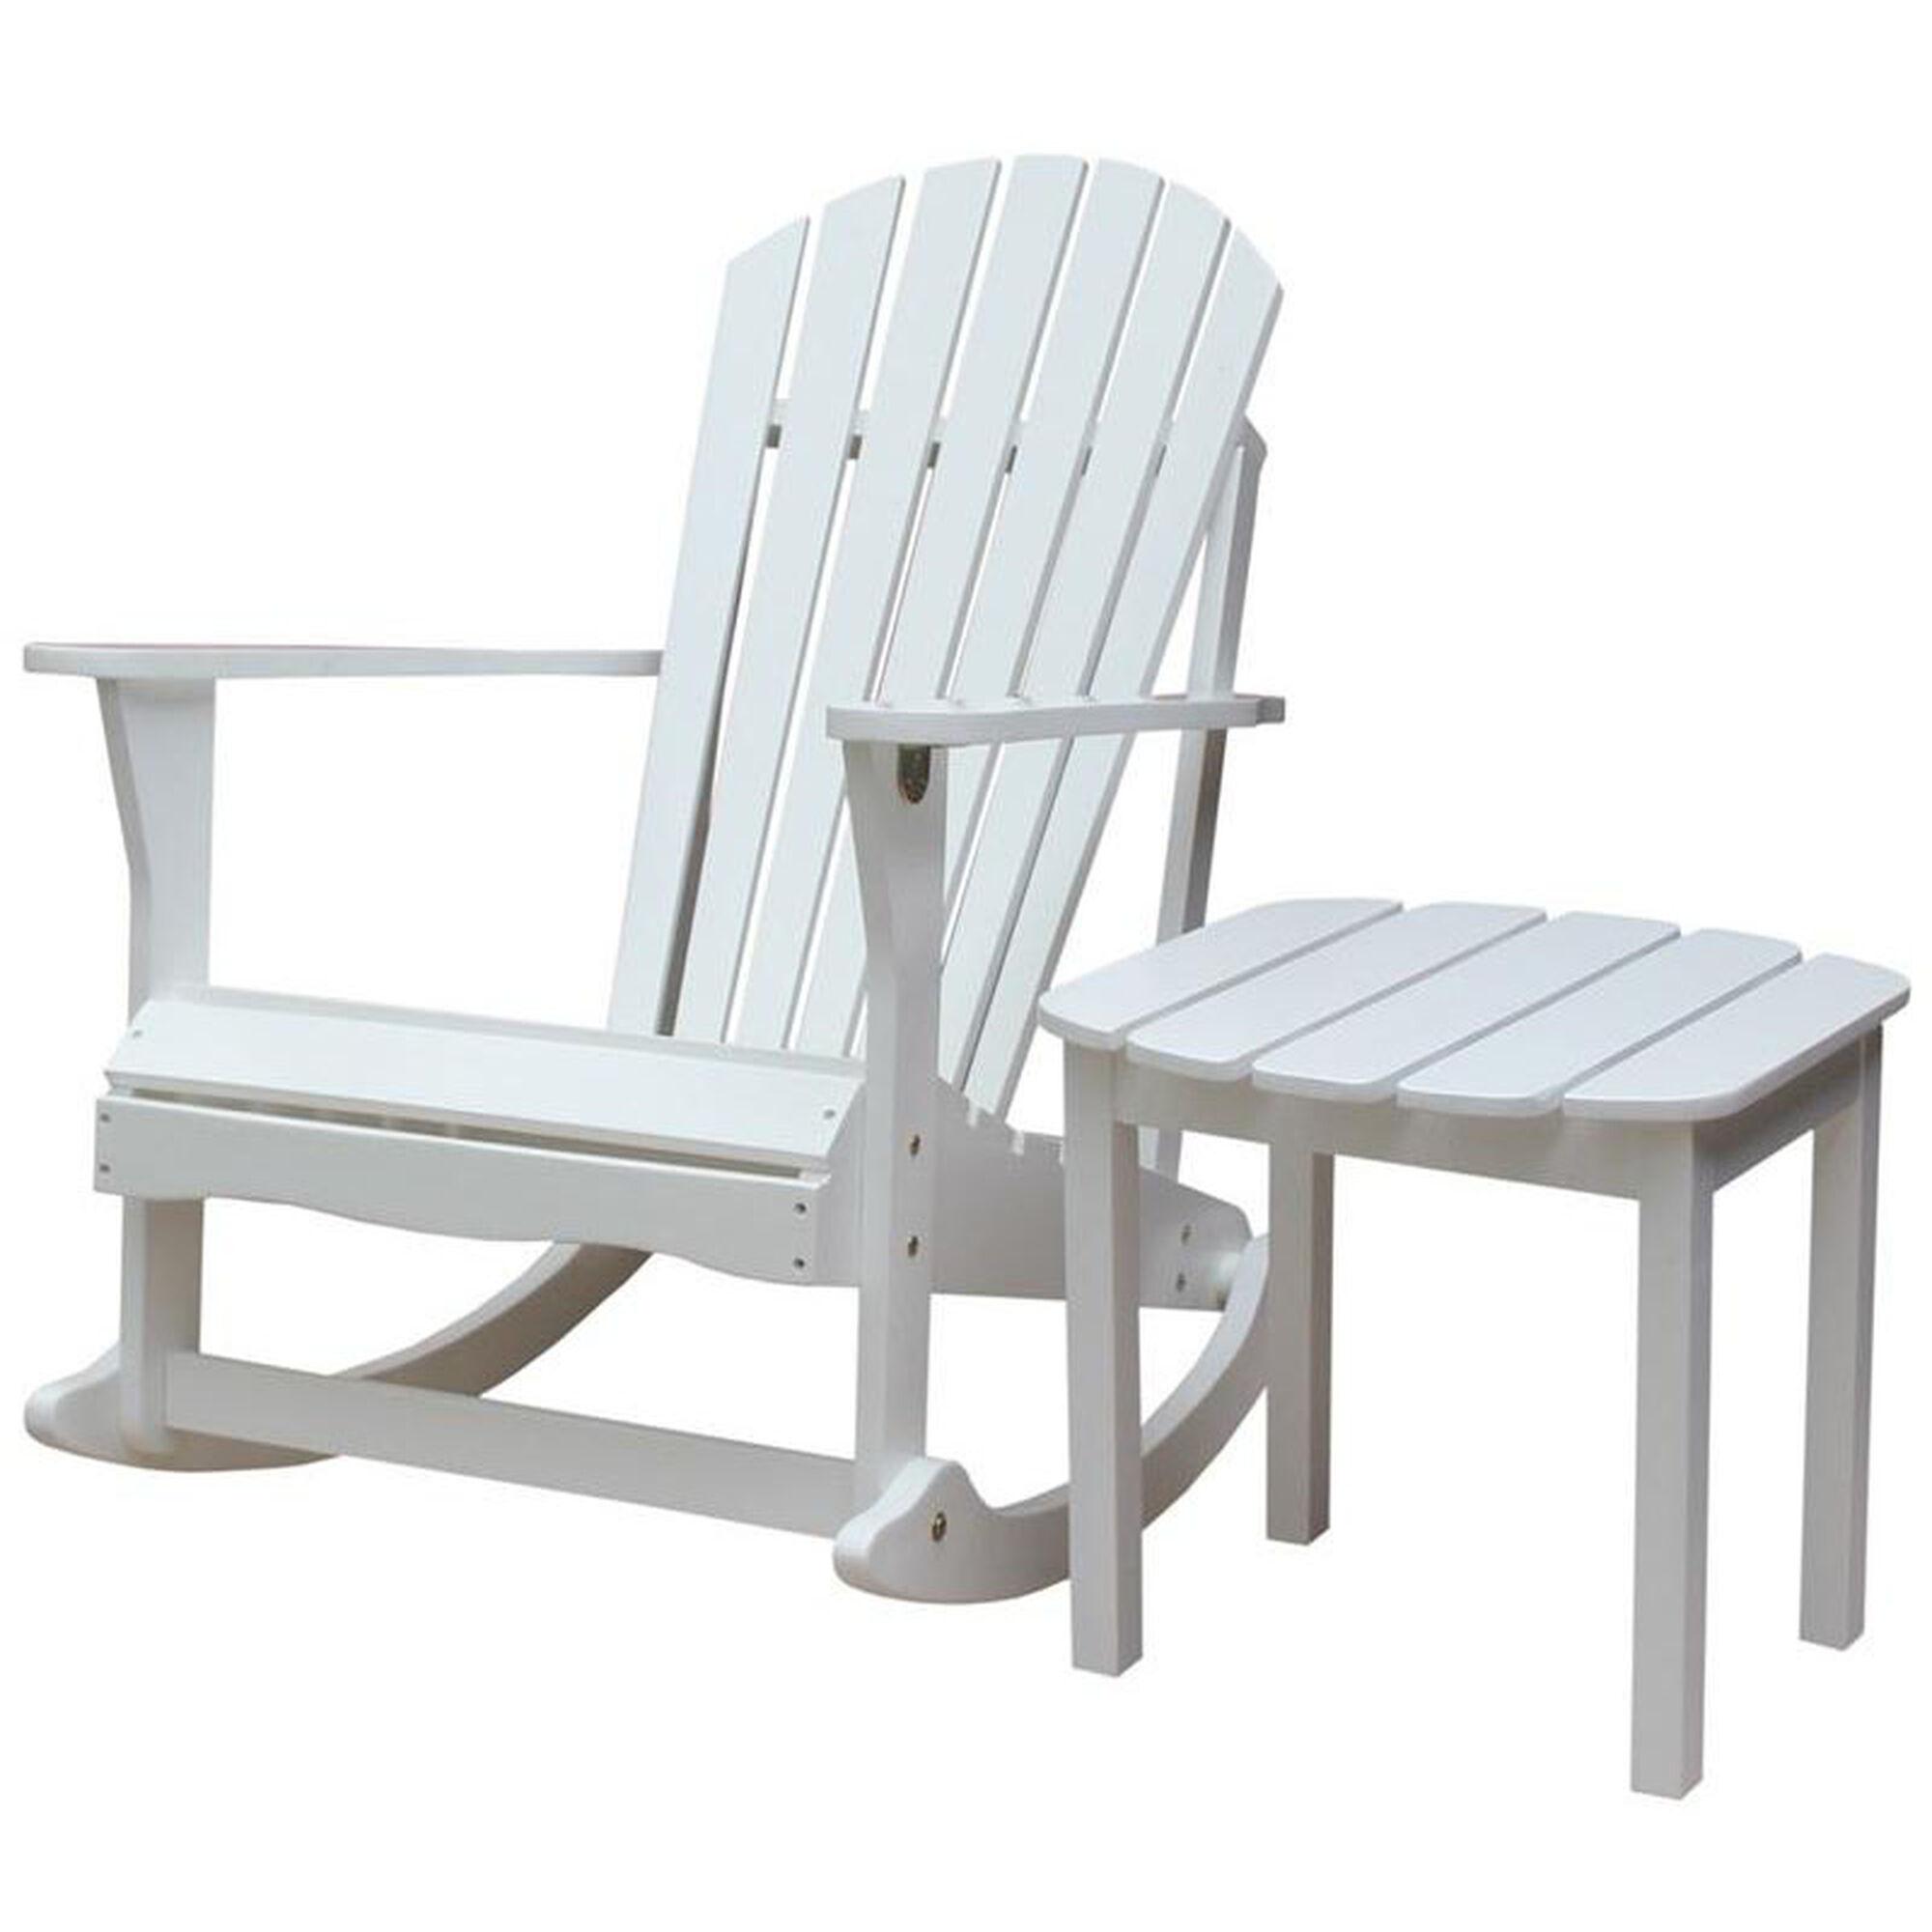 Two Piece Adirondack Chair K 52581 900 Bizchair Com